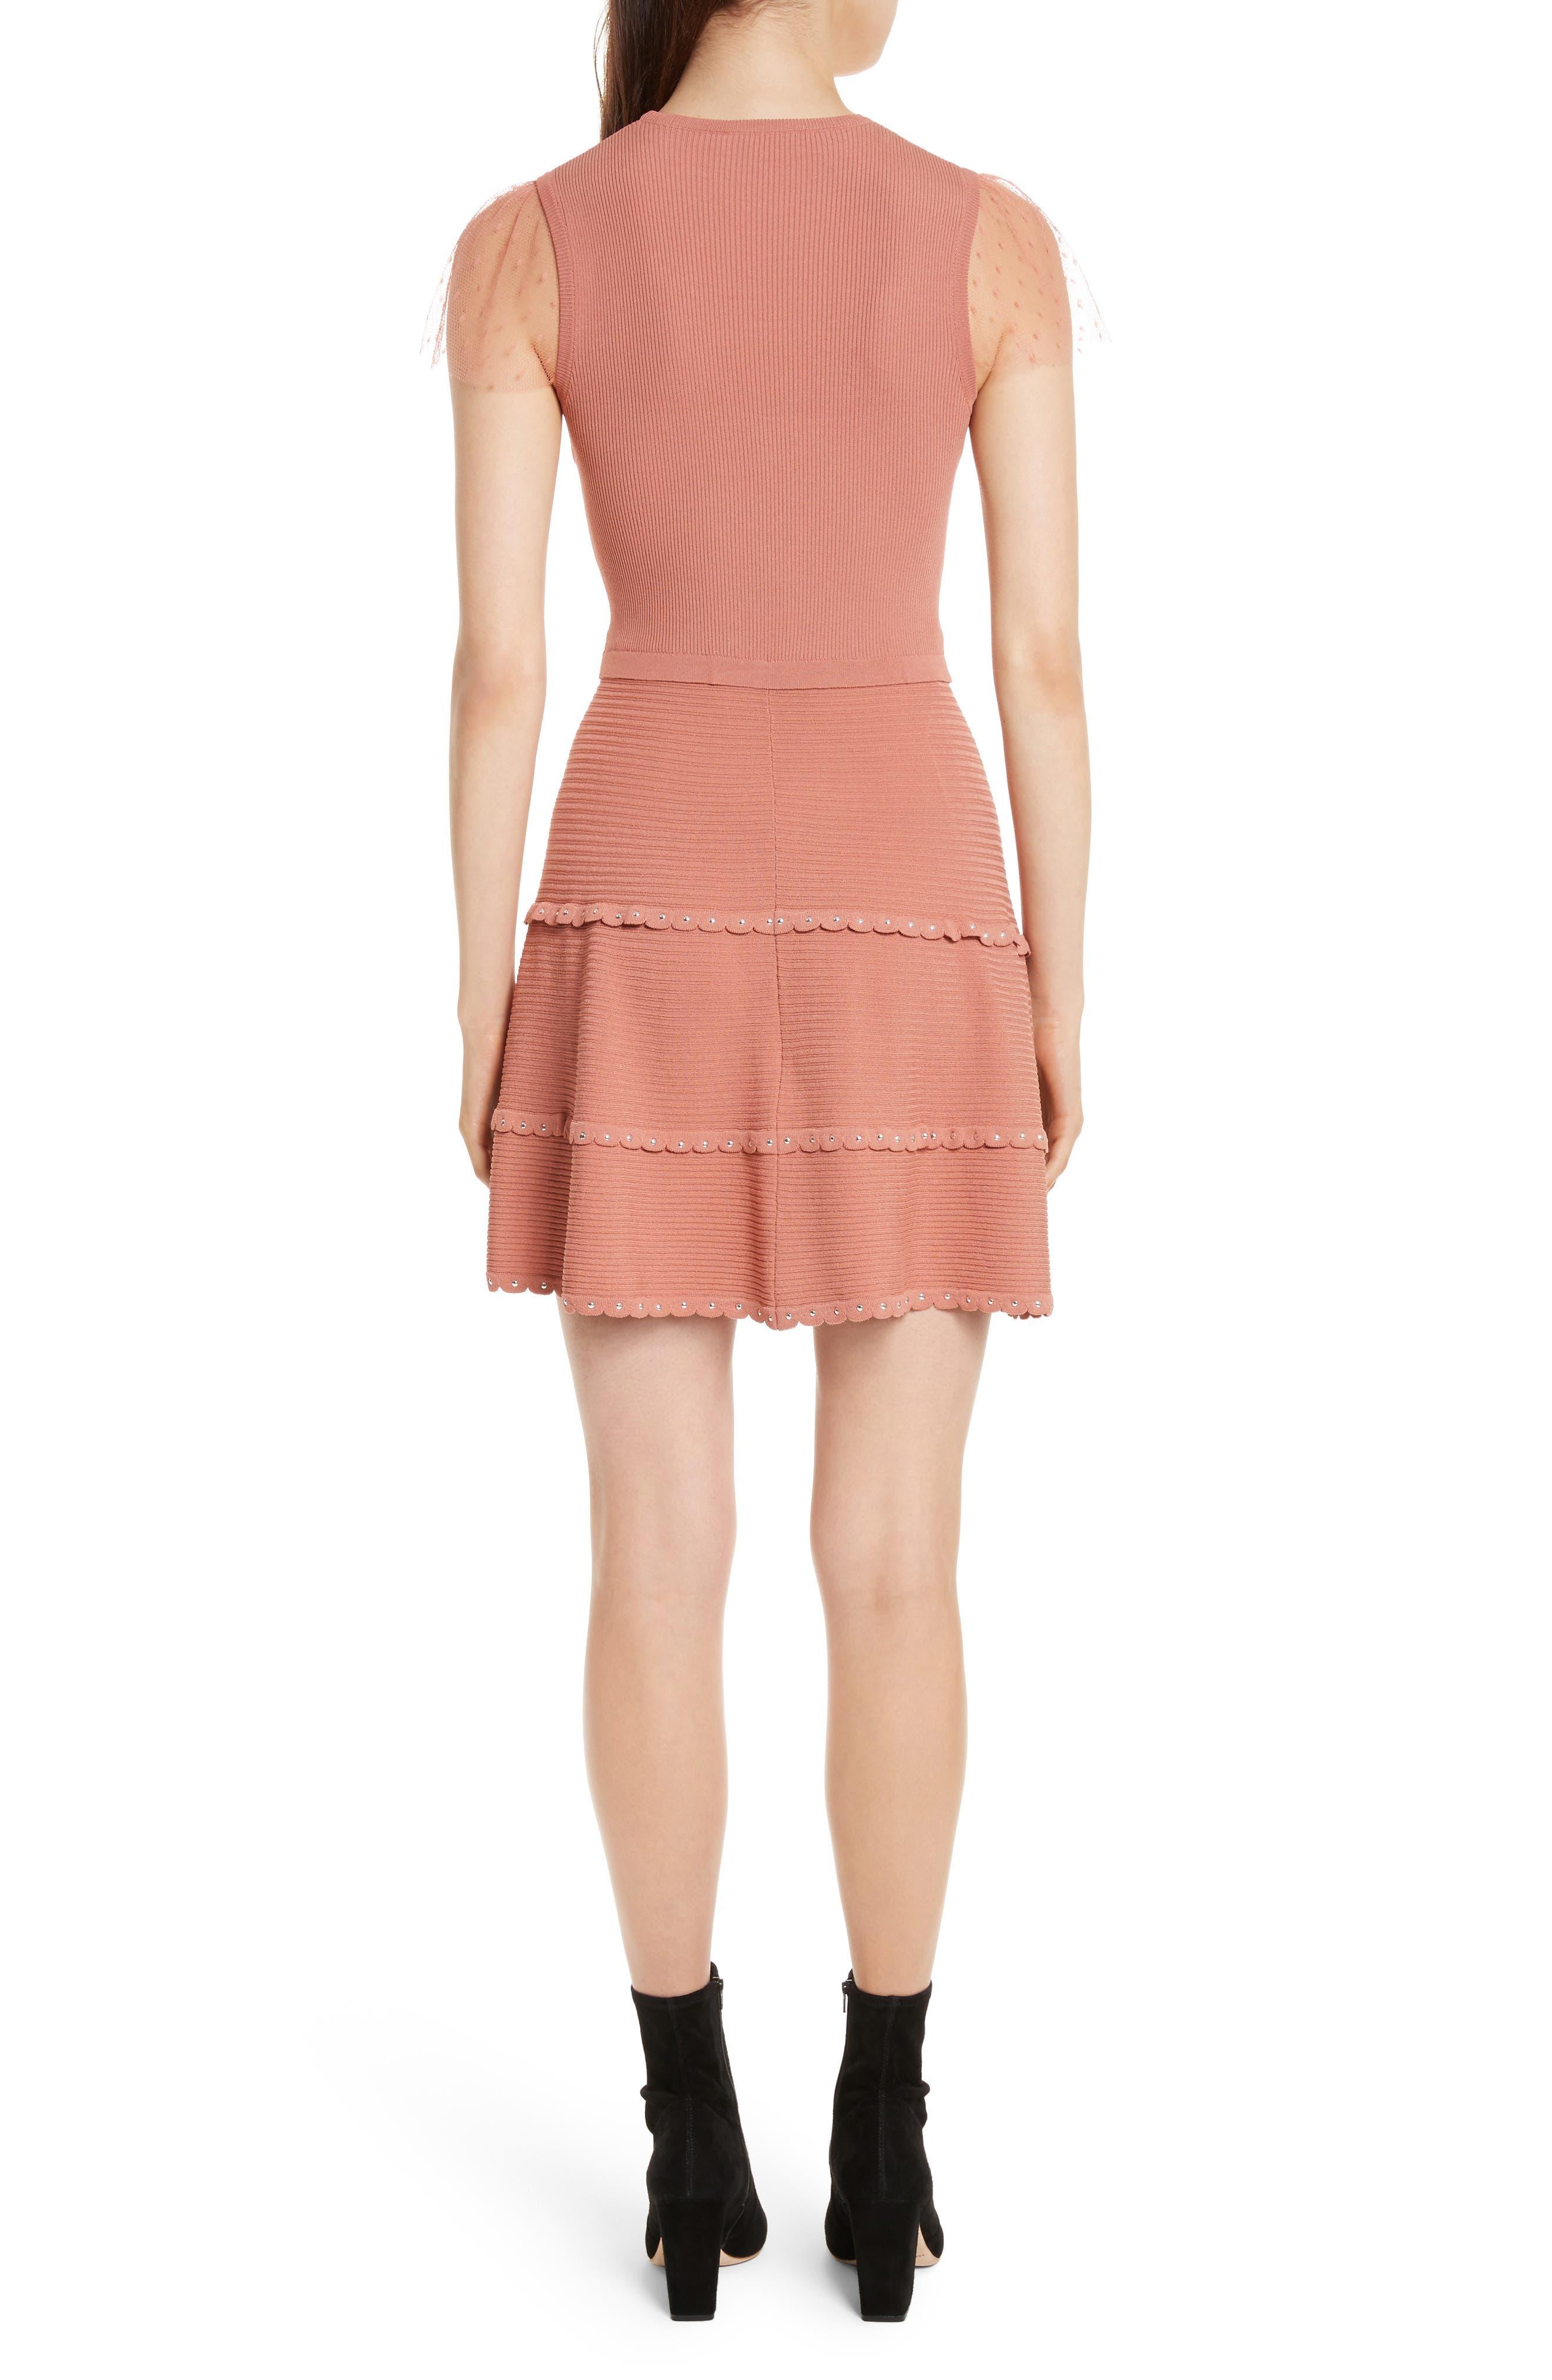 Scallop Stretch Knit Dress,                             Alternate thumbnail 2, color,